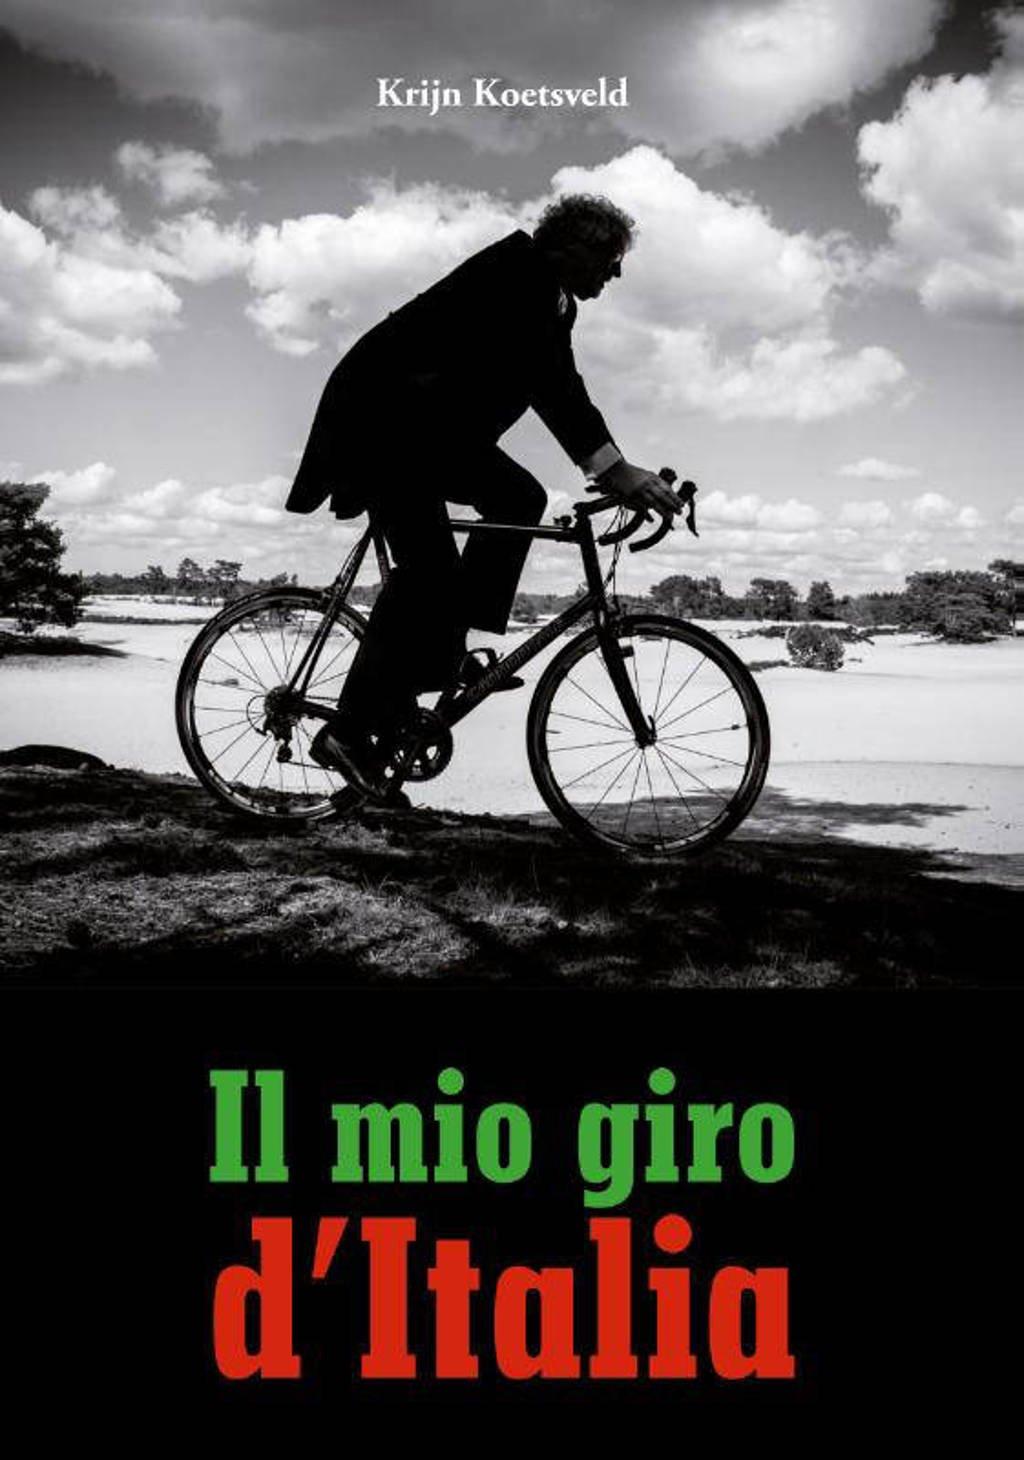 Il mio giro d'Italia - Krijn Koetsveld